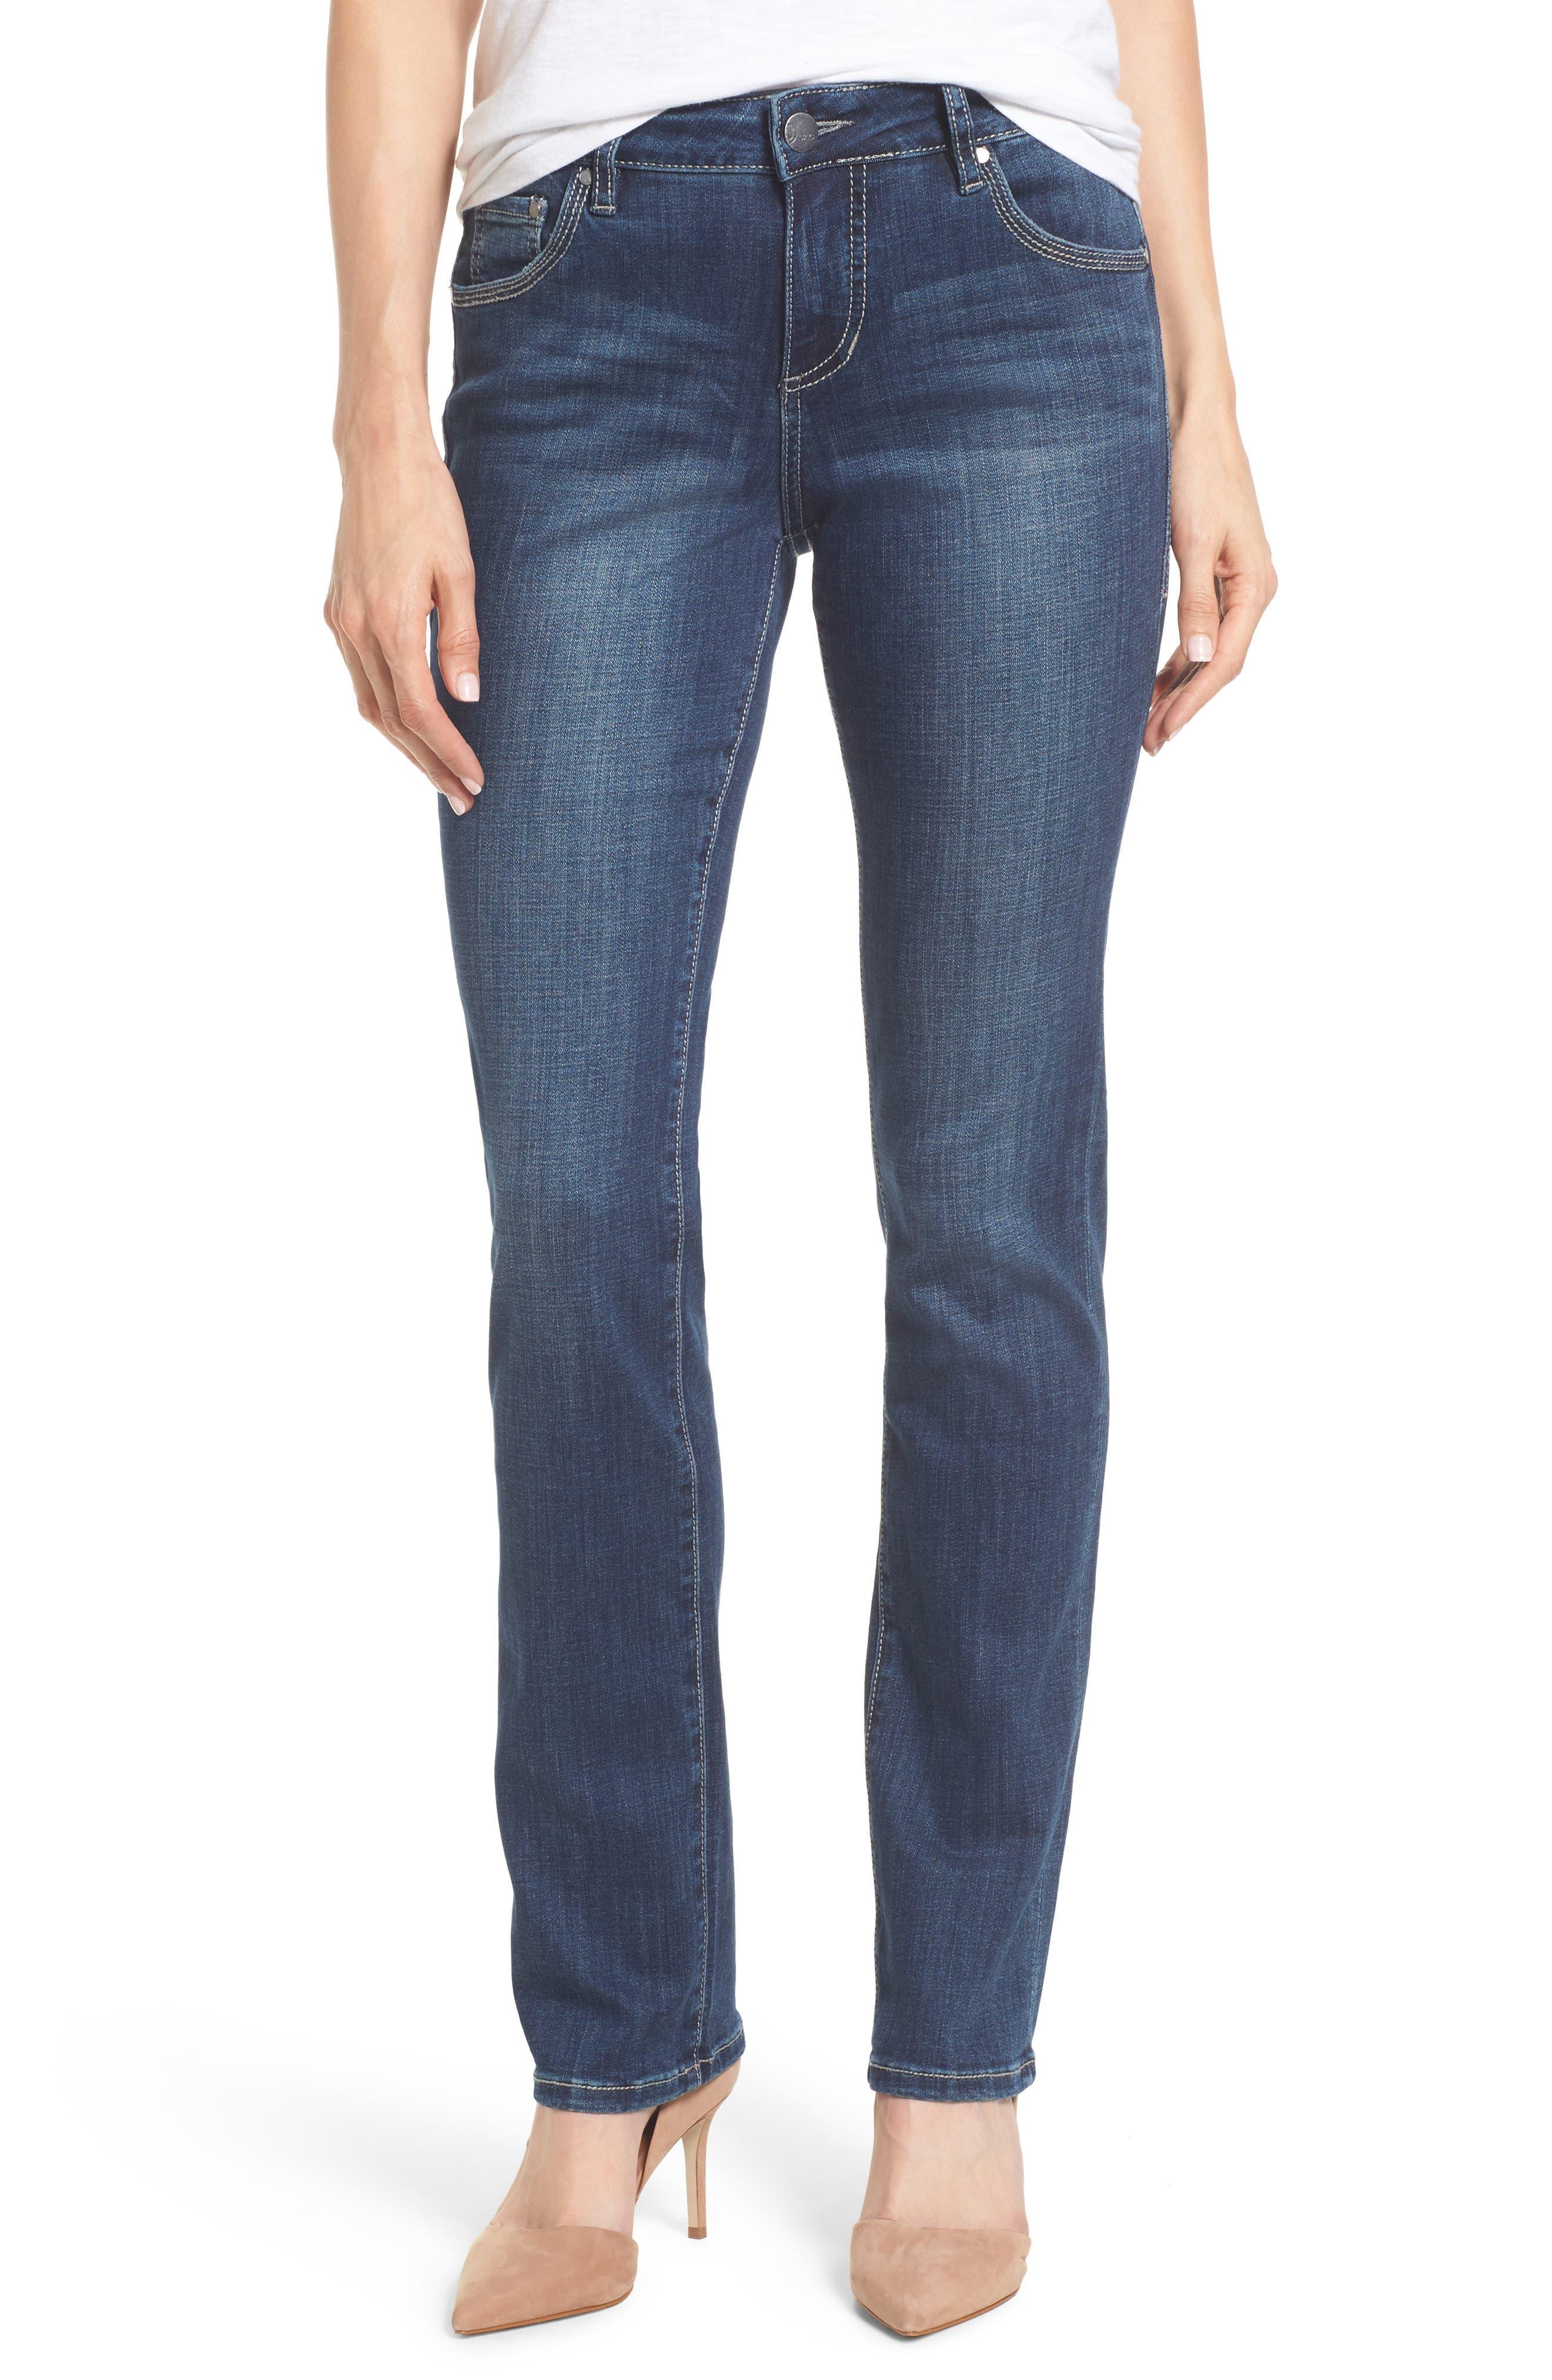 Adrian Straight Leg Jeans,                         Main,                         color,